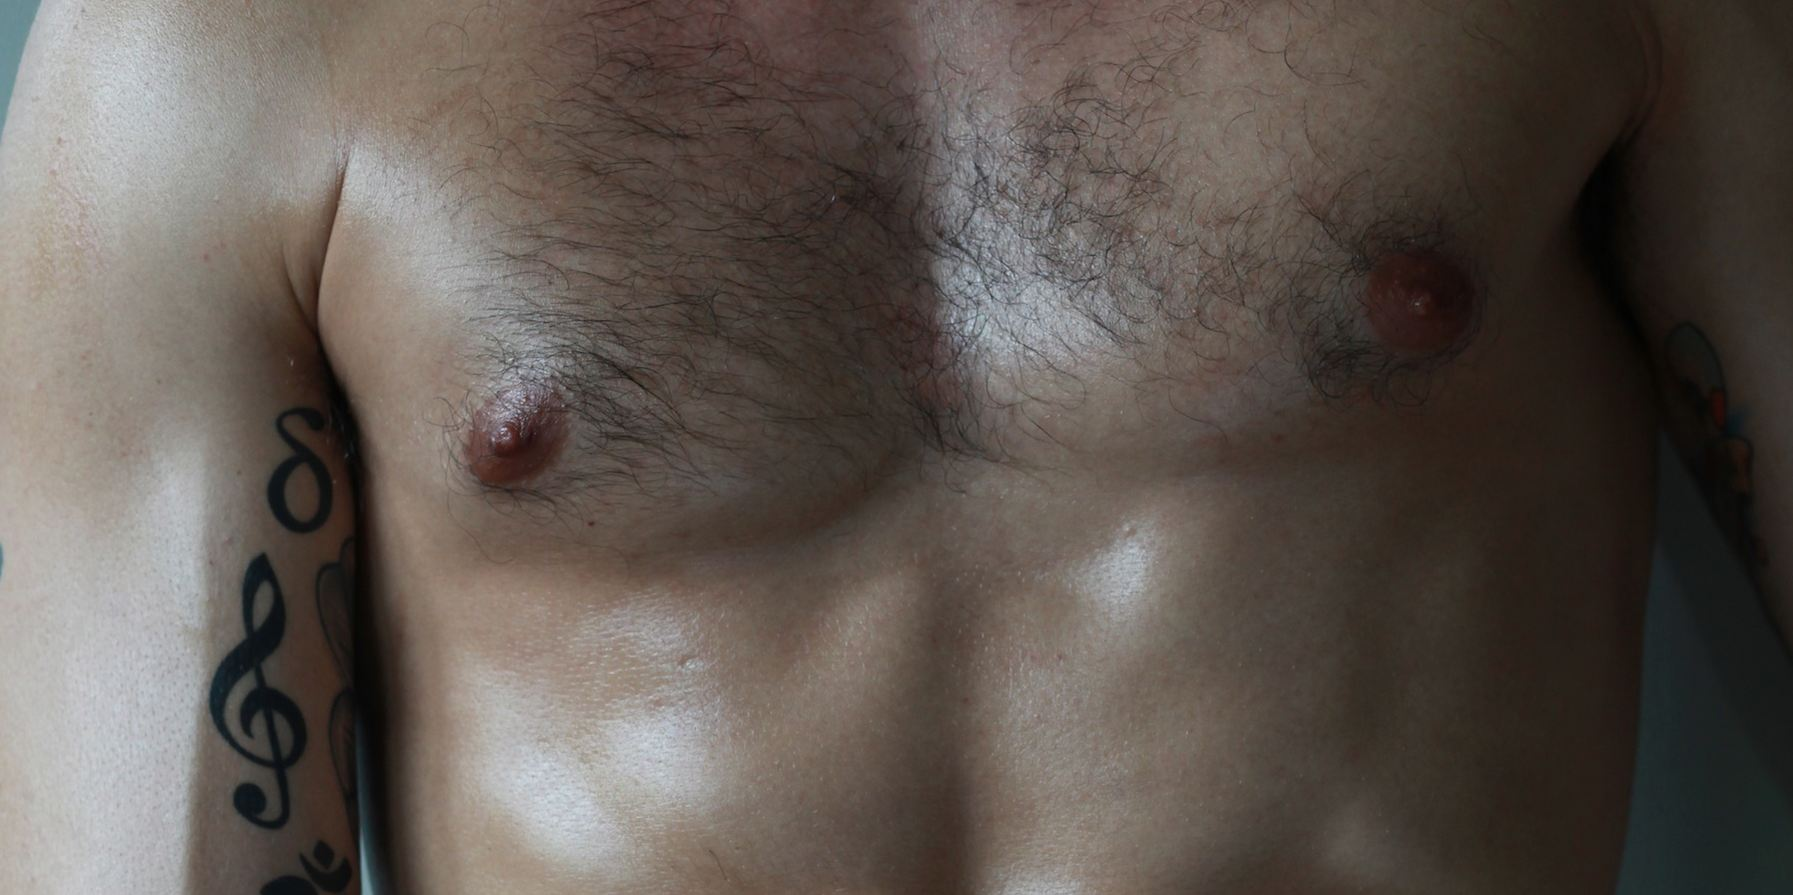 benj-godfre-torso-10.JPG